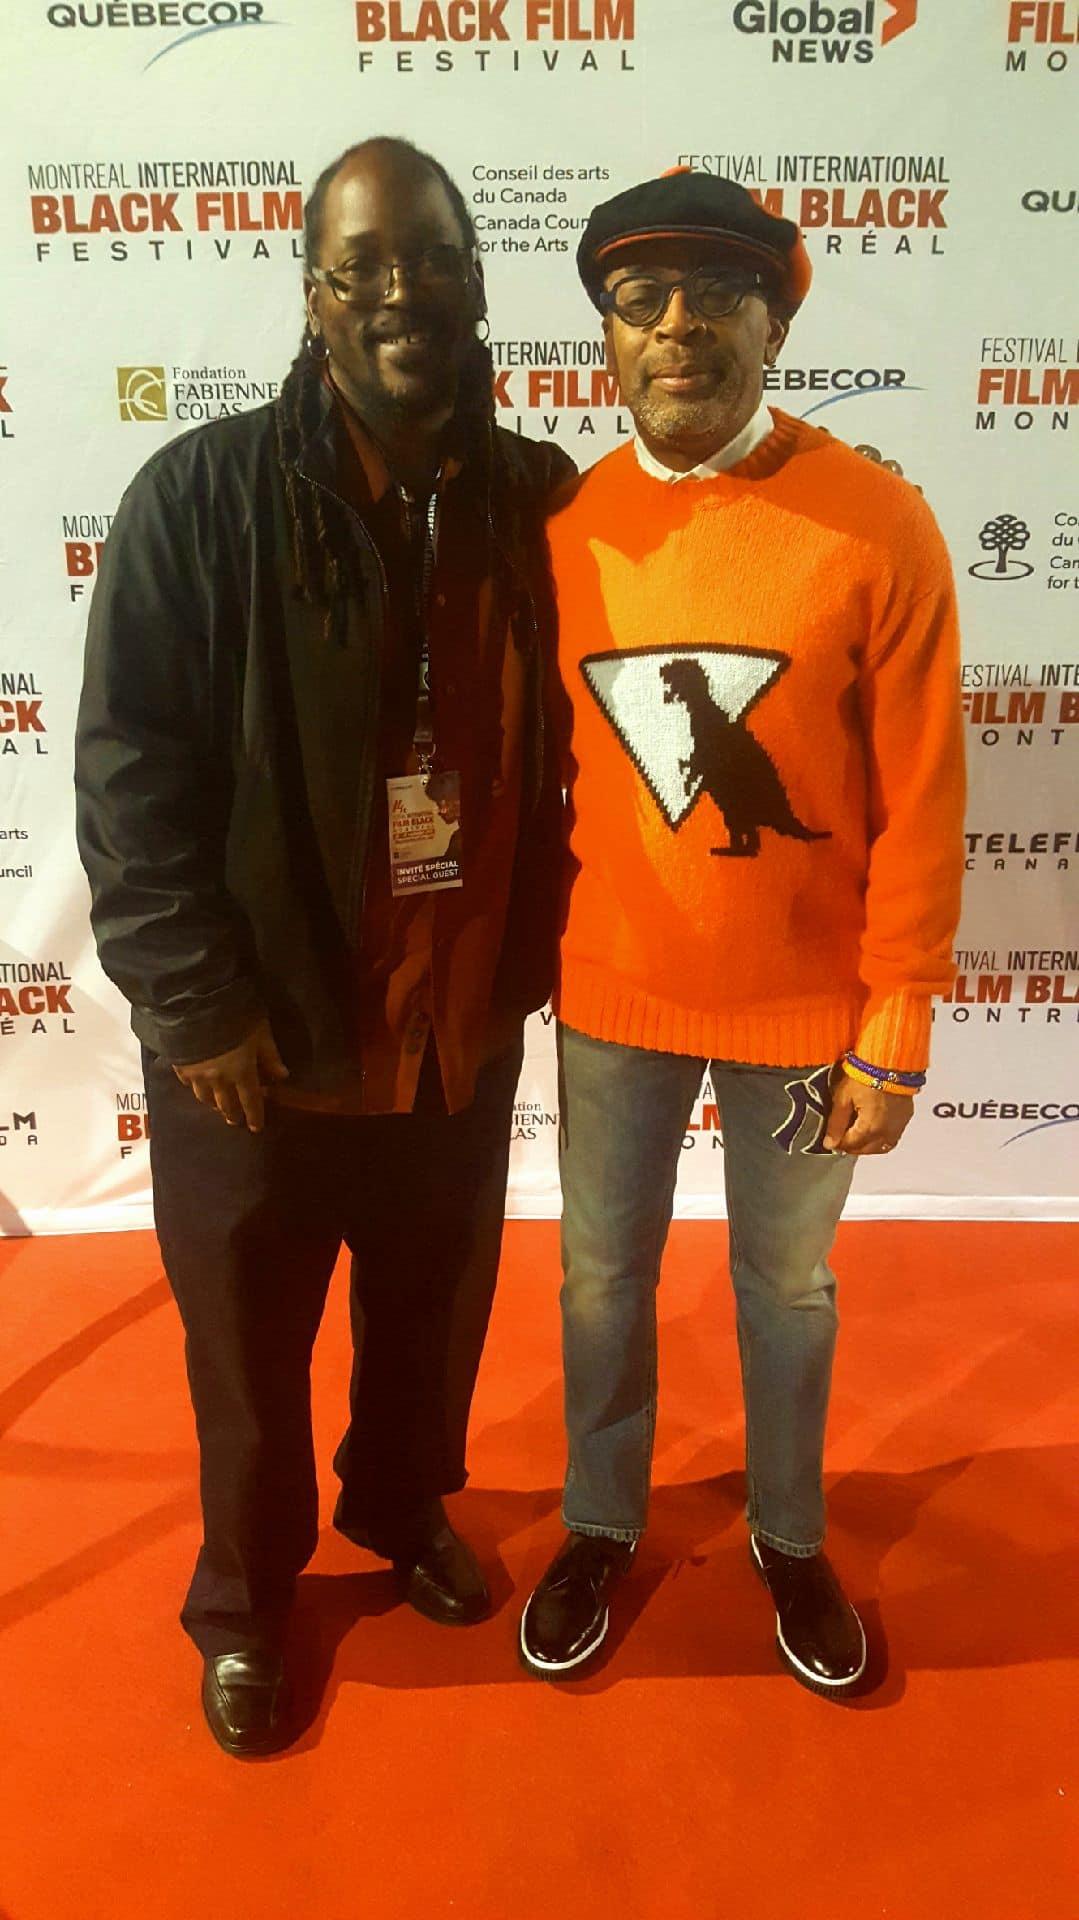 Brian Shackelford & Spike Lee